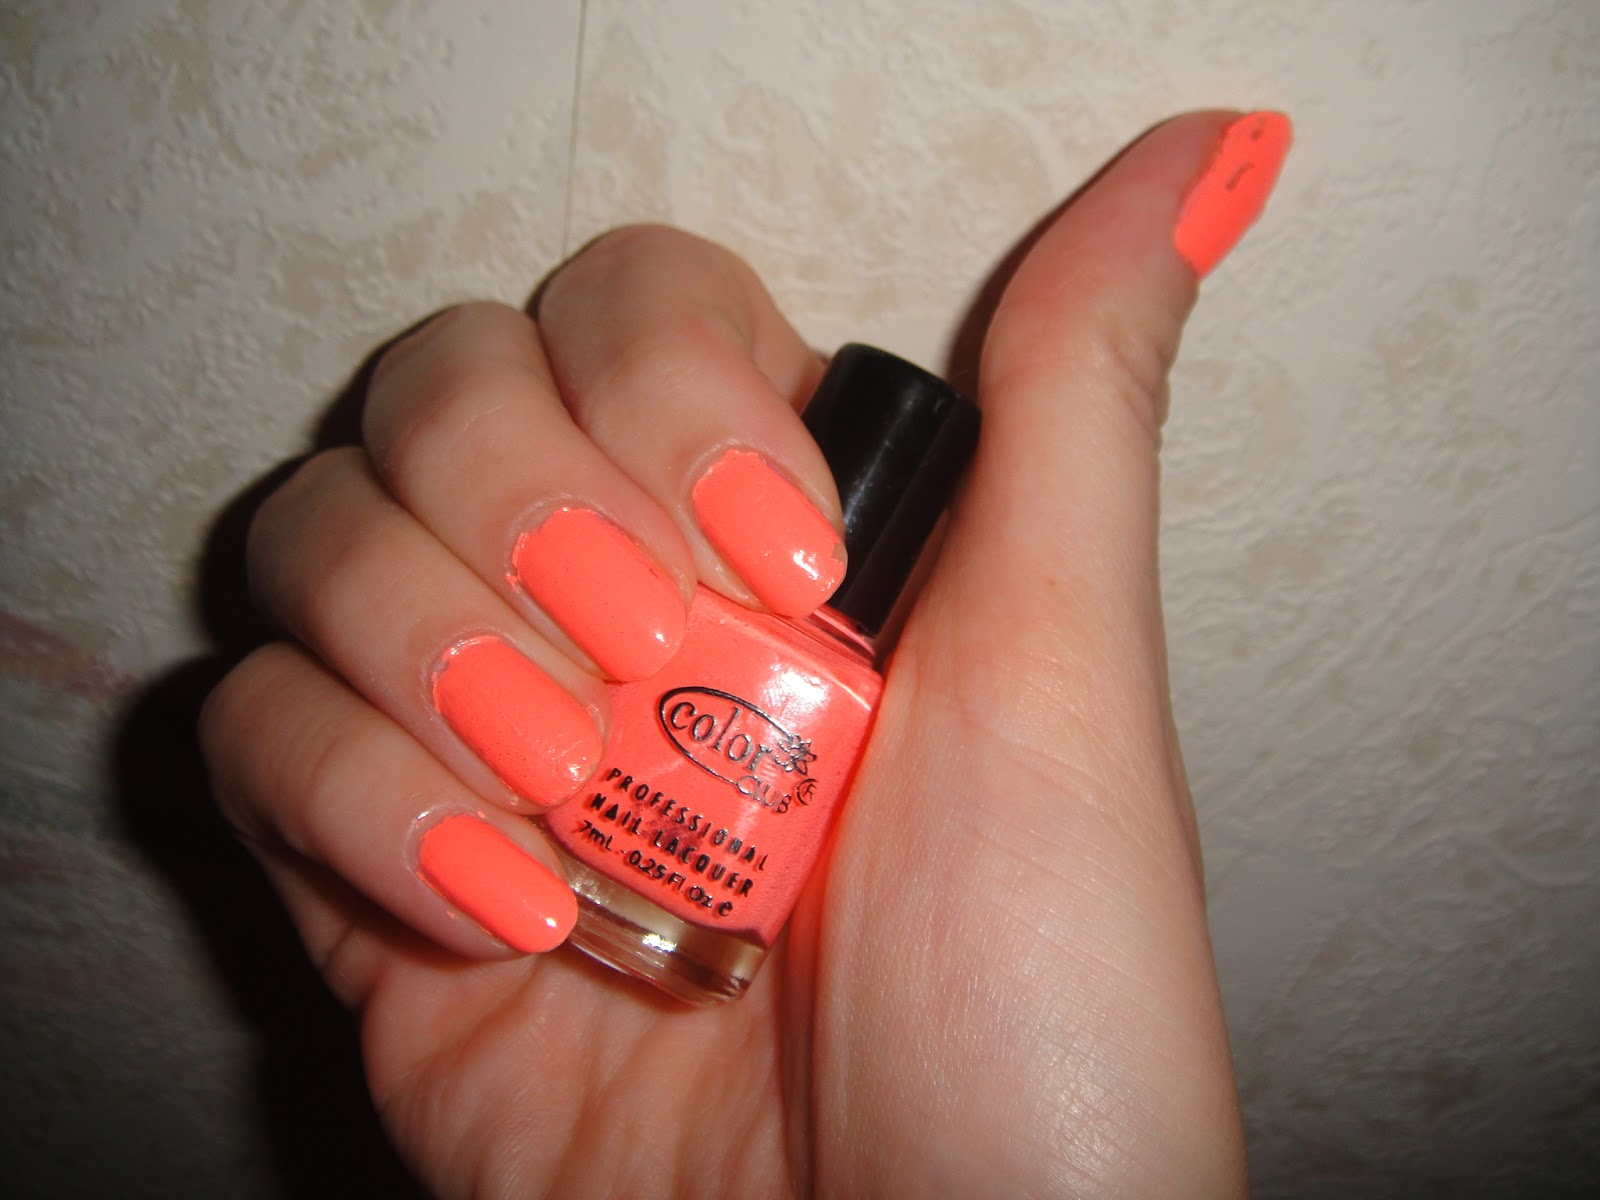 birchbox exclusive, color club nail polish birchbox, birchbox polish, color club nail polish, color club reign in spain swatch, reign in spain